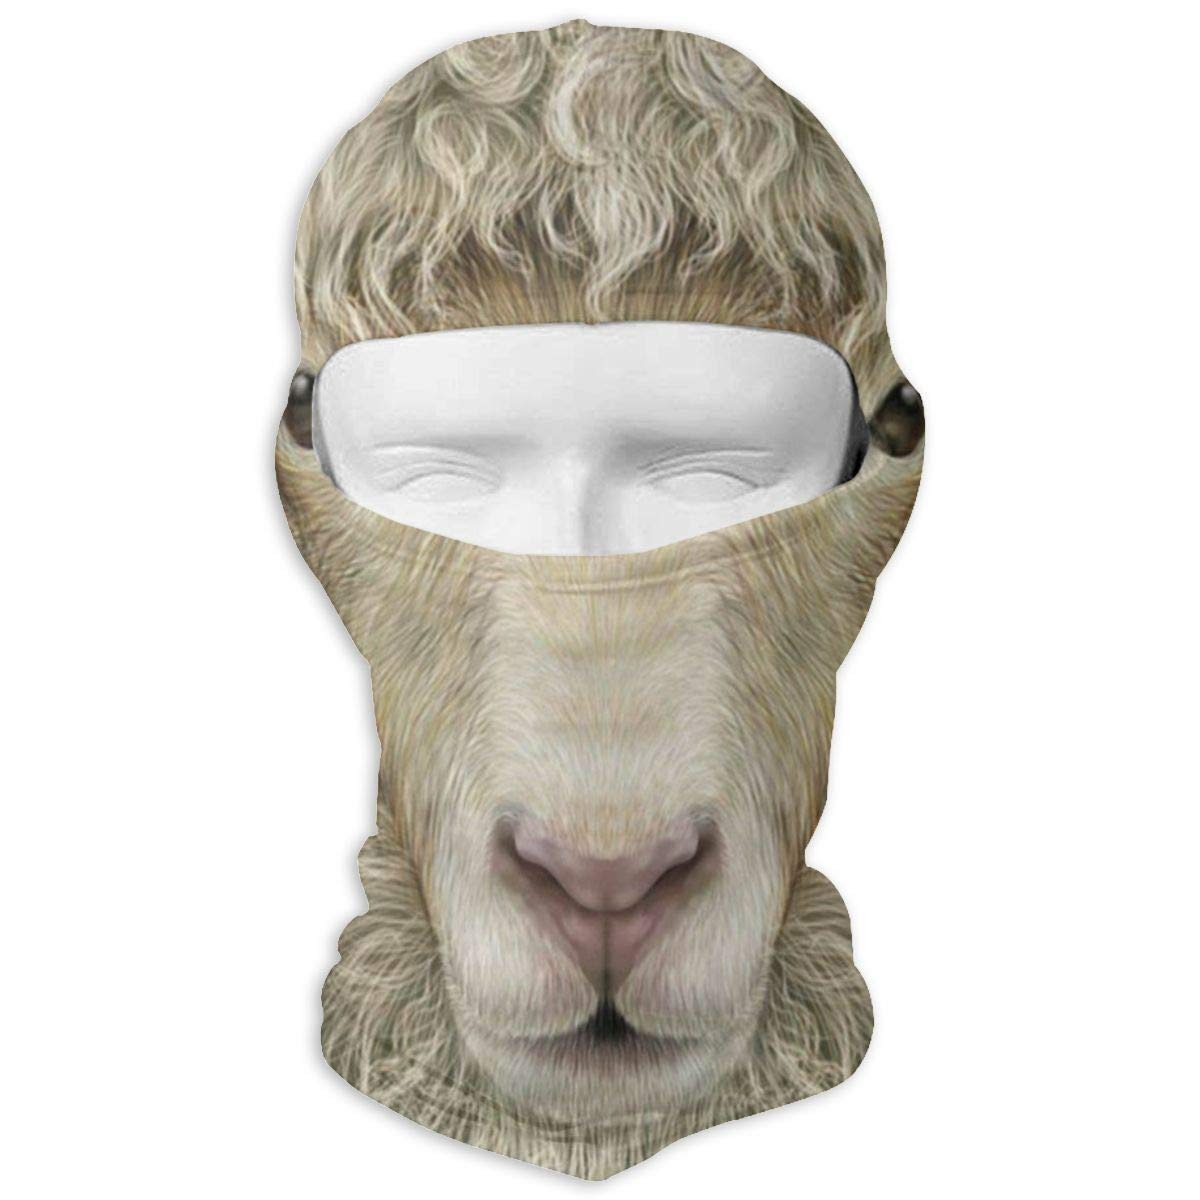 National Crisis and Democracy Lisang-cute-sheep-portrait-full-face-masks-uv-balaclava-hood-D_NQ_NP_628489-MCO30862631358_052019-F